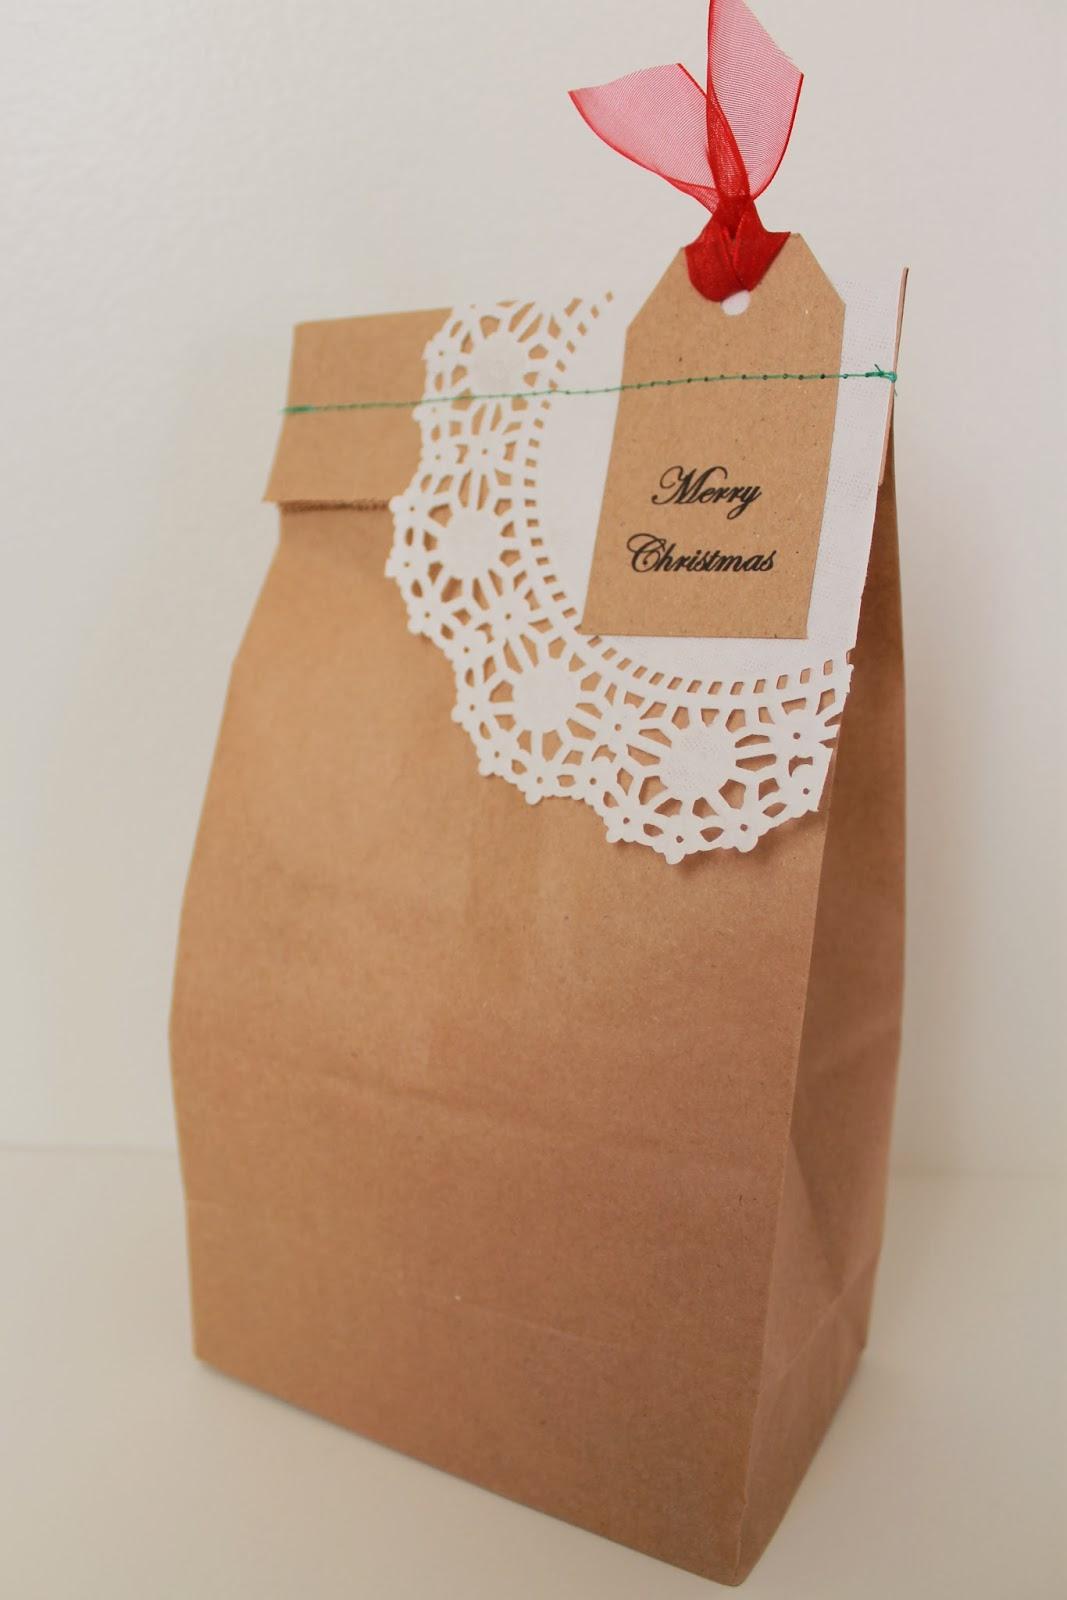 Serving Pink Lemonade: Dressing Up Papers Bag for Holiday Gift Giving